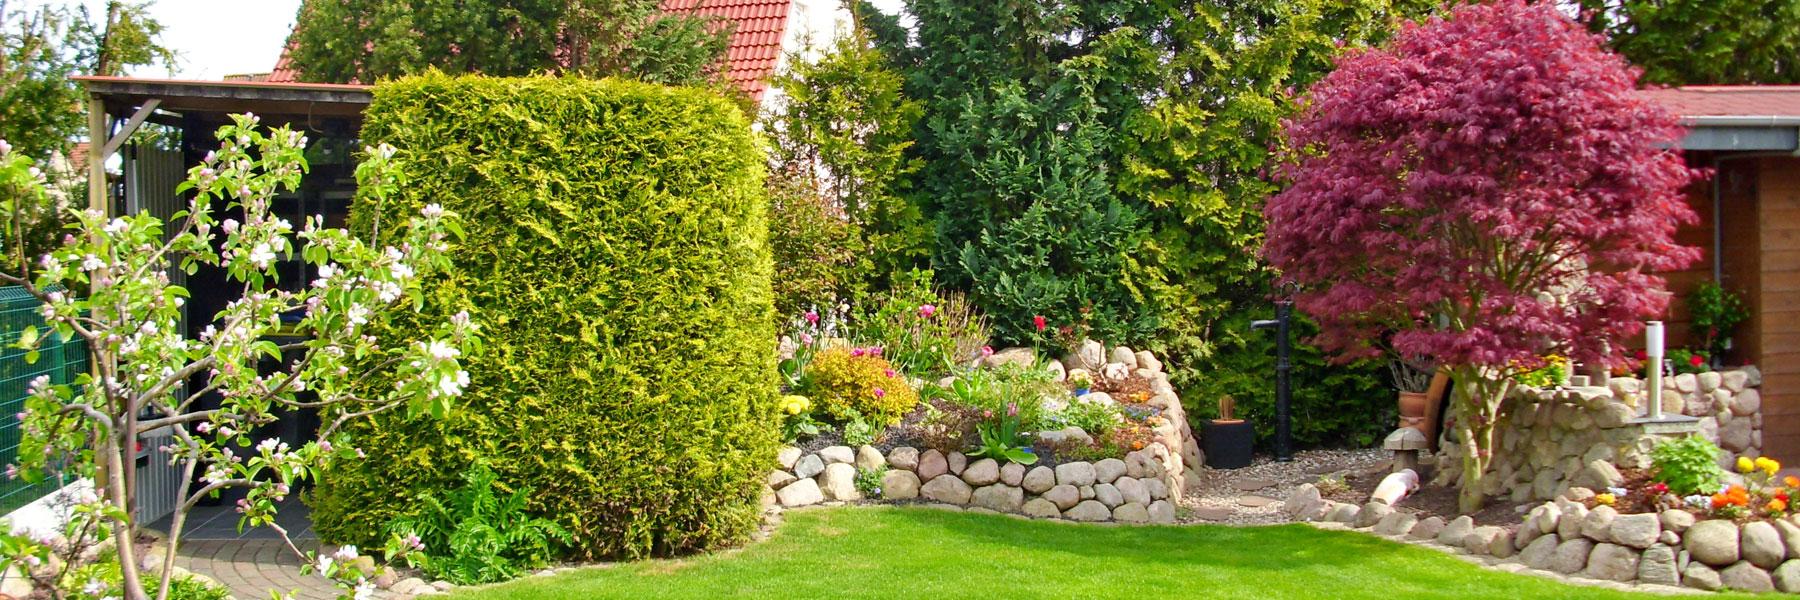 Garten - Fewo Hildebrandt